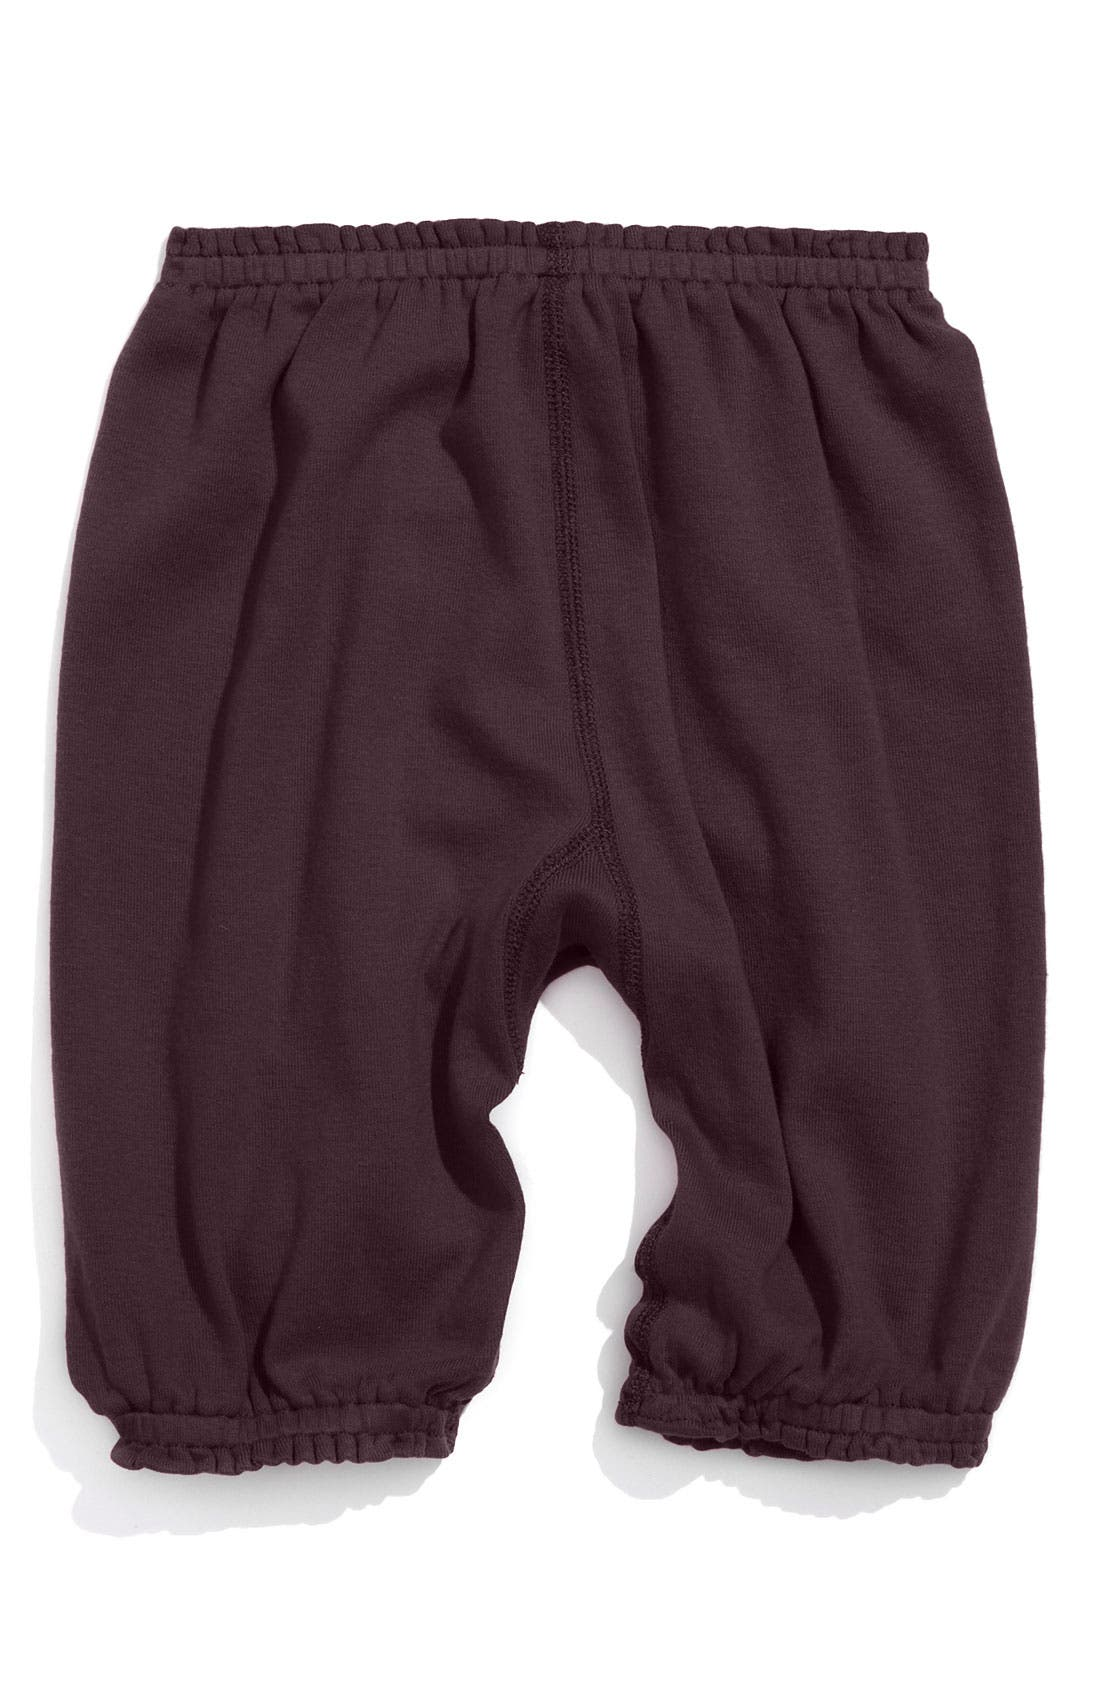 Main Image - Peek 'Little Peanut' Happy Pants (Infant)